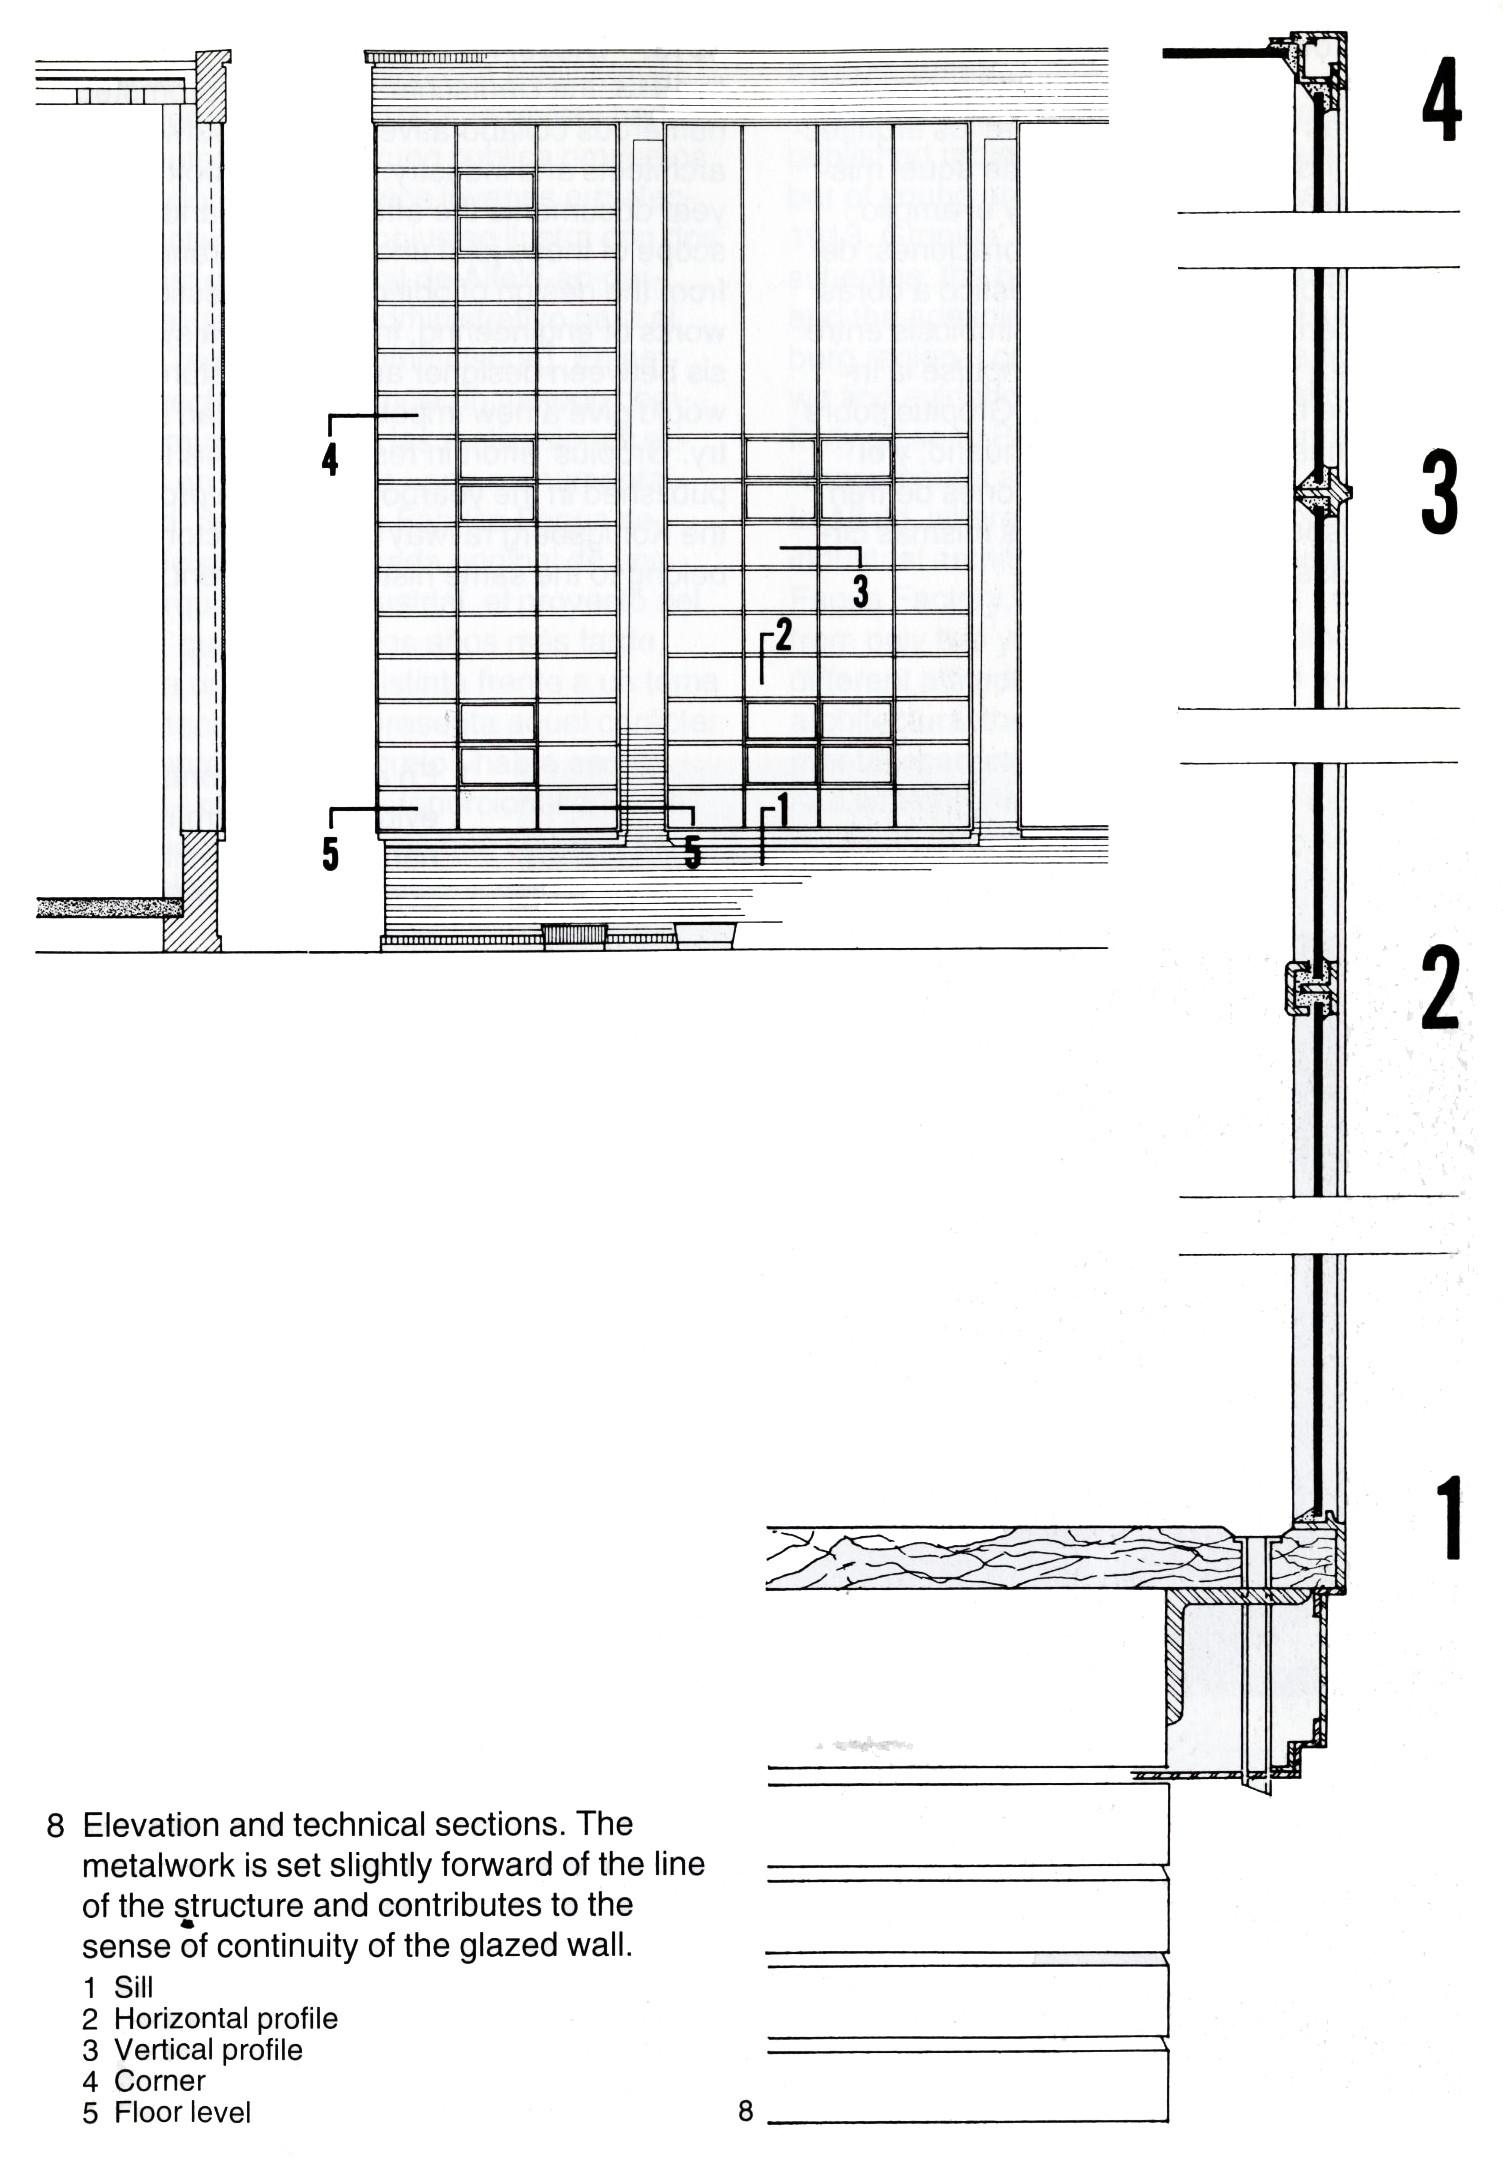 AD Classics Fagus Factory Walter Gropius Adolf Meyer – Meyer May House Floor Plan